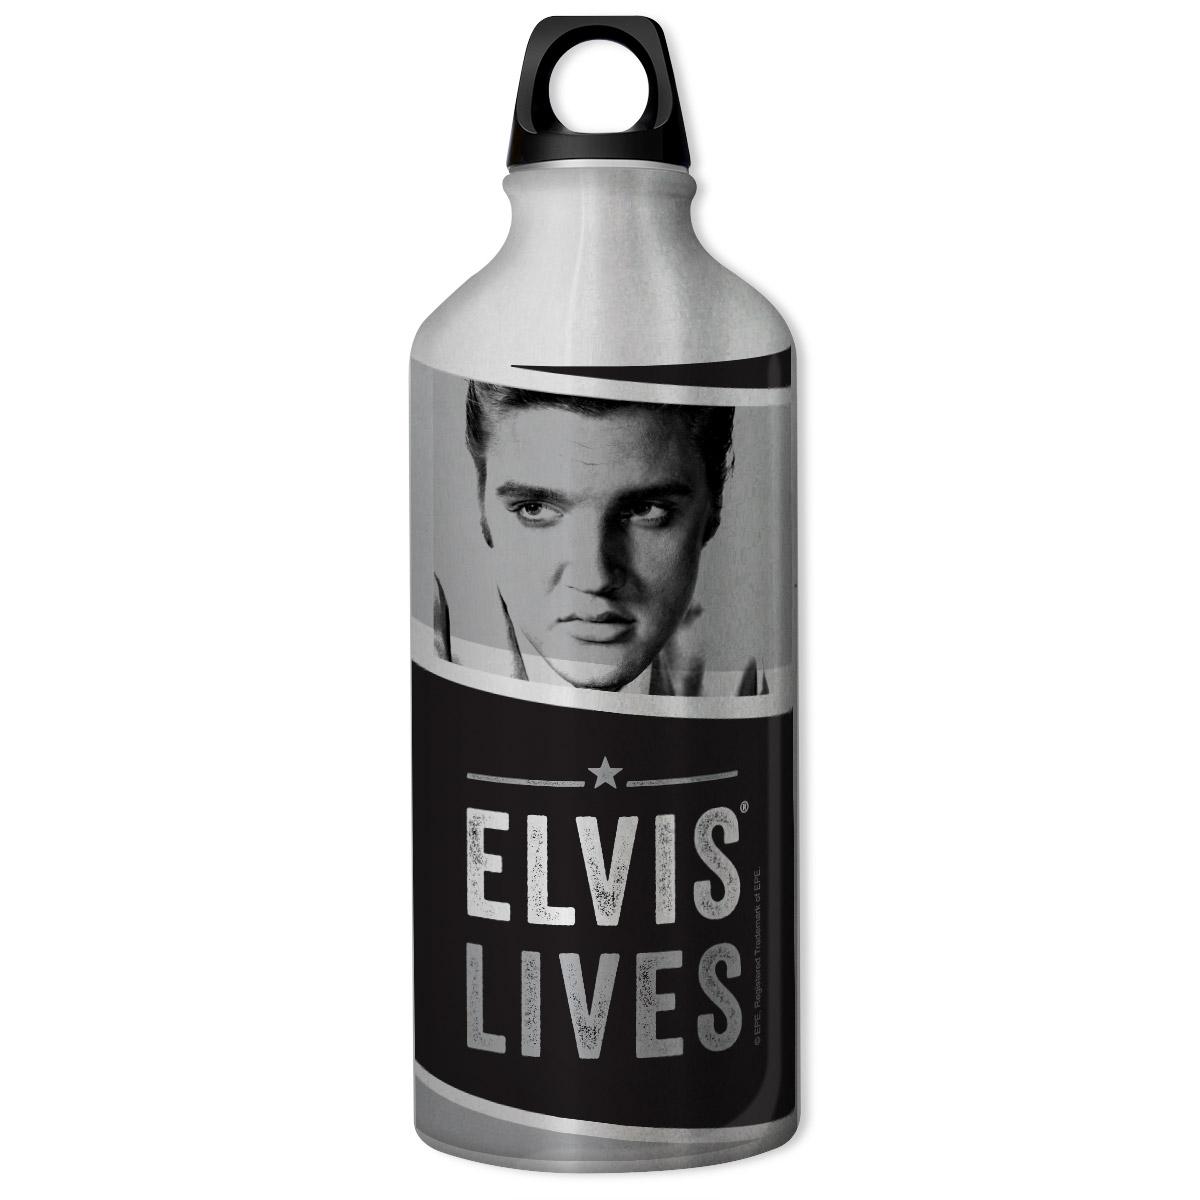 Squeeze Elvis Presley Lives 2